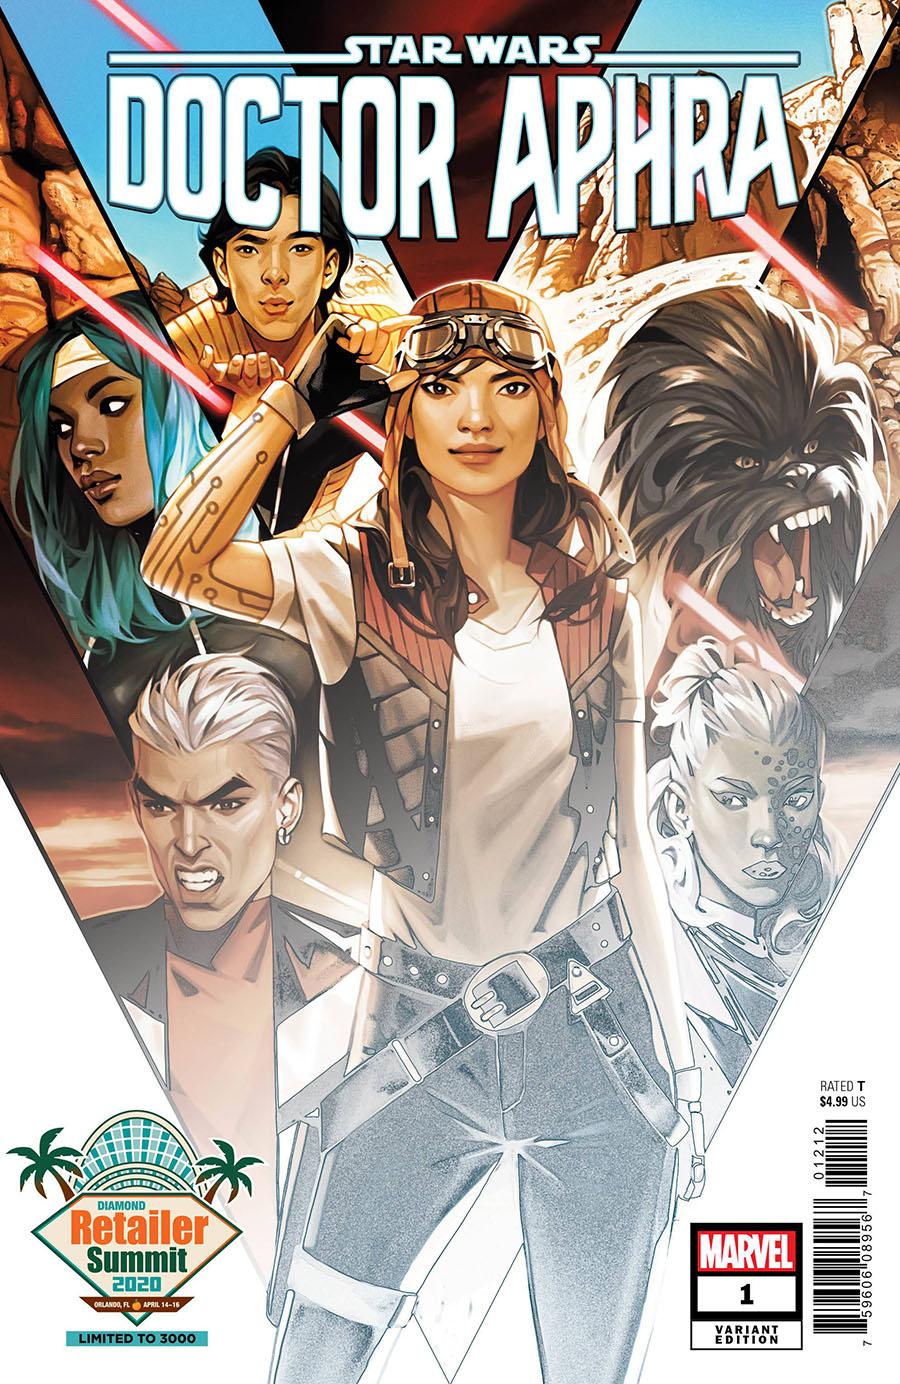 Star Wars Doctor Aphra Vol 2 #1 Cover E Retailer Summit 2020 Valentina Remenar Variant Cover